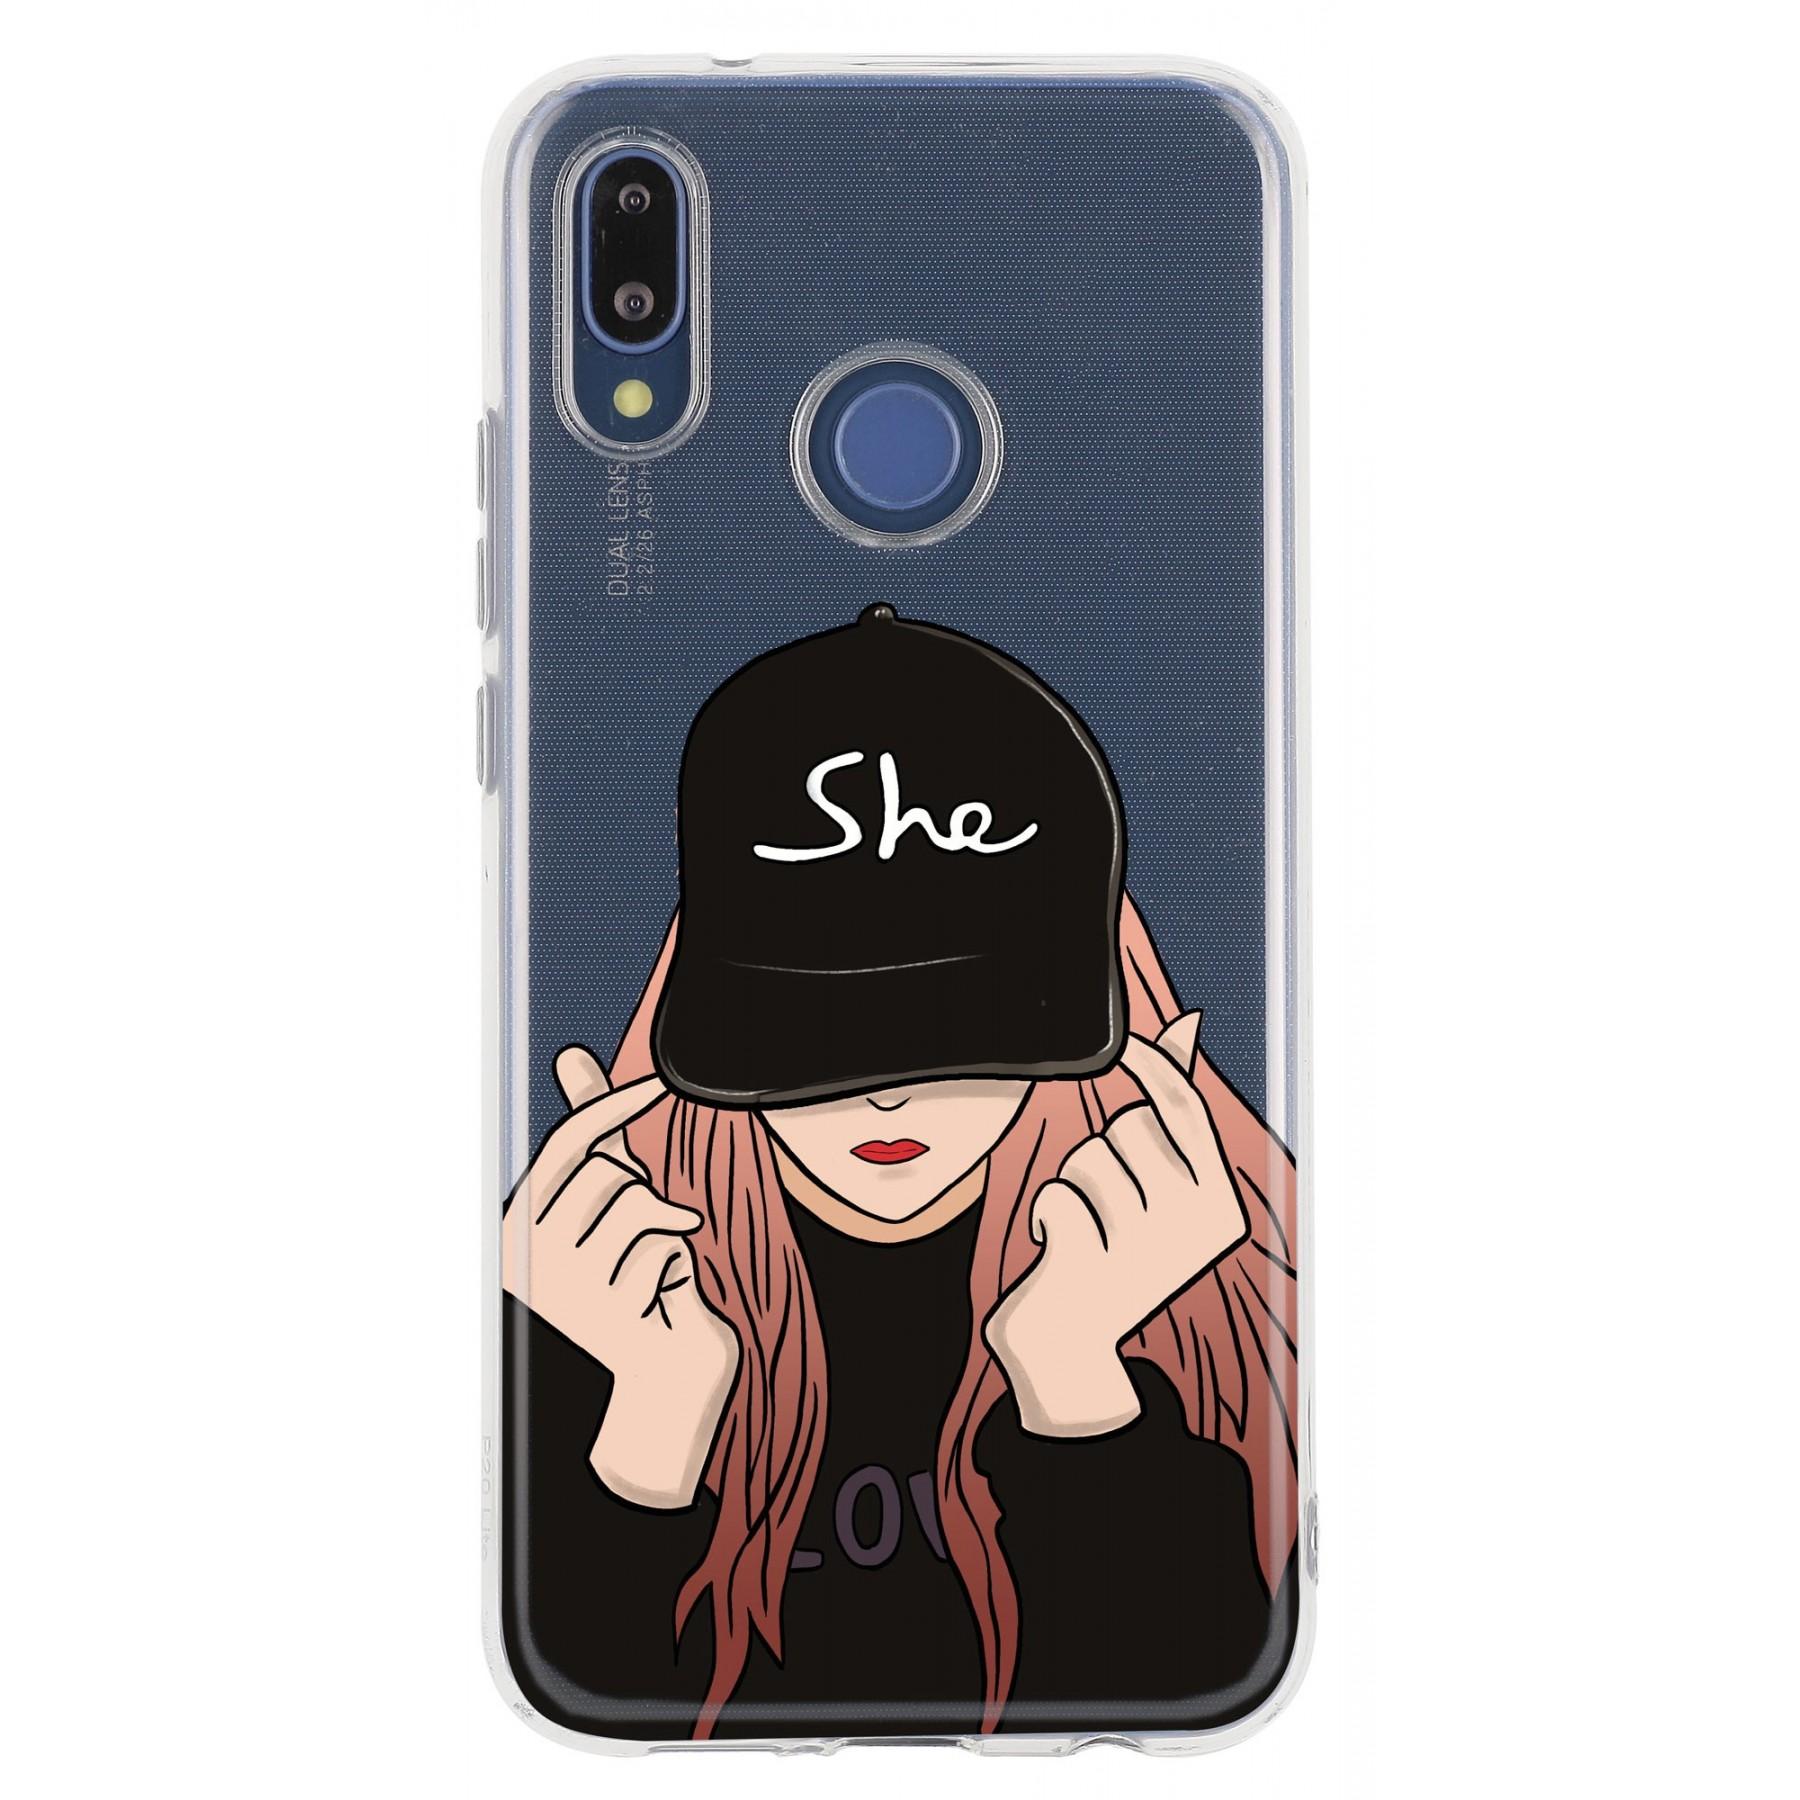 Coque girl casquette personnalisable pour Huawei P20 lite